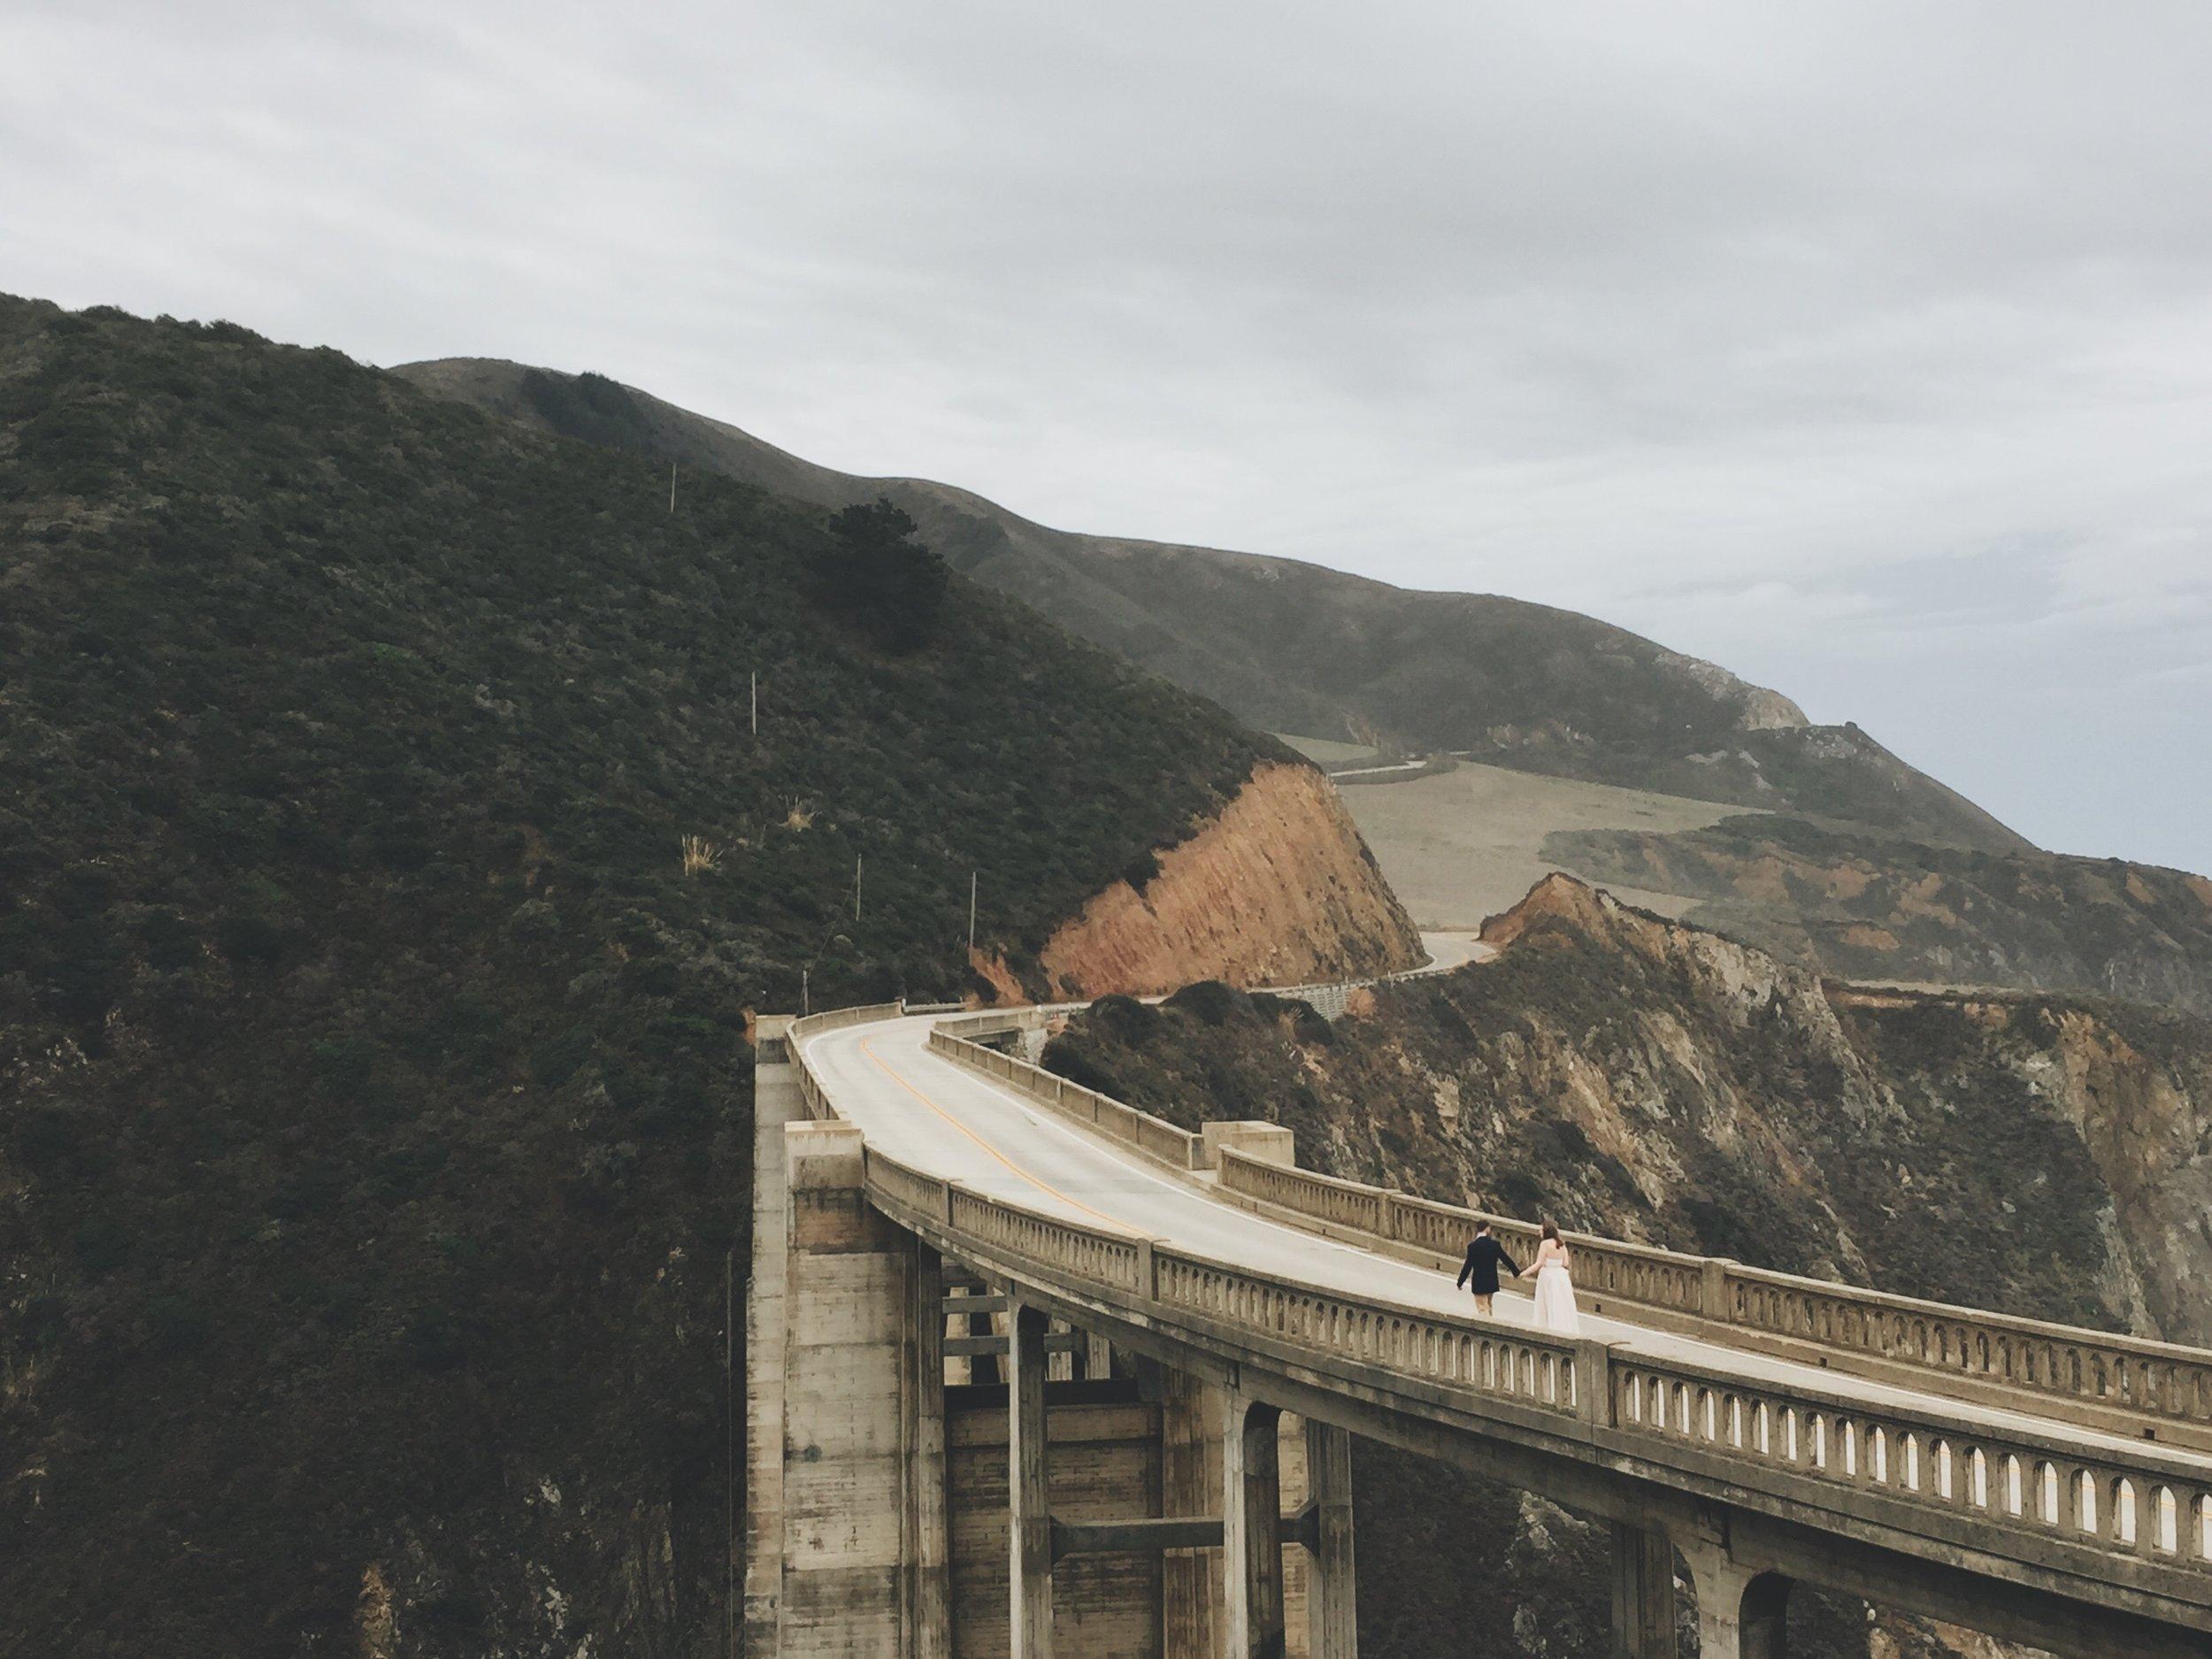 Sarah Rotrock and Ricky Stephens walking down Bixby Creek Bridge in Big Sur California